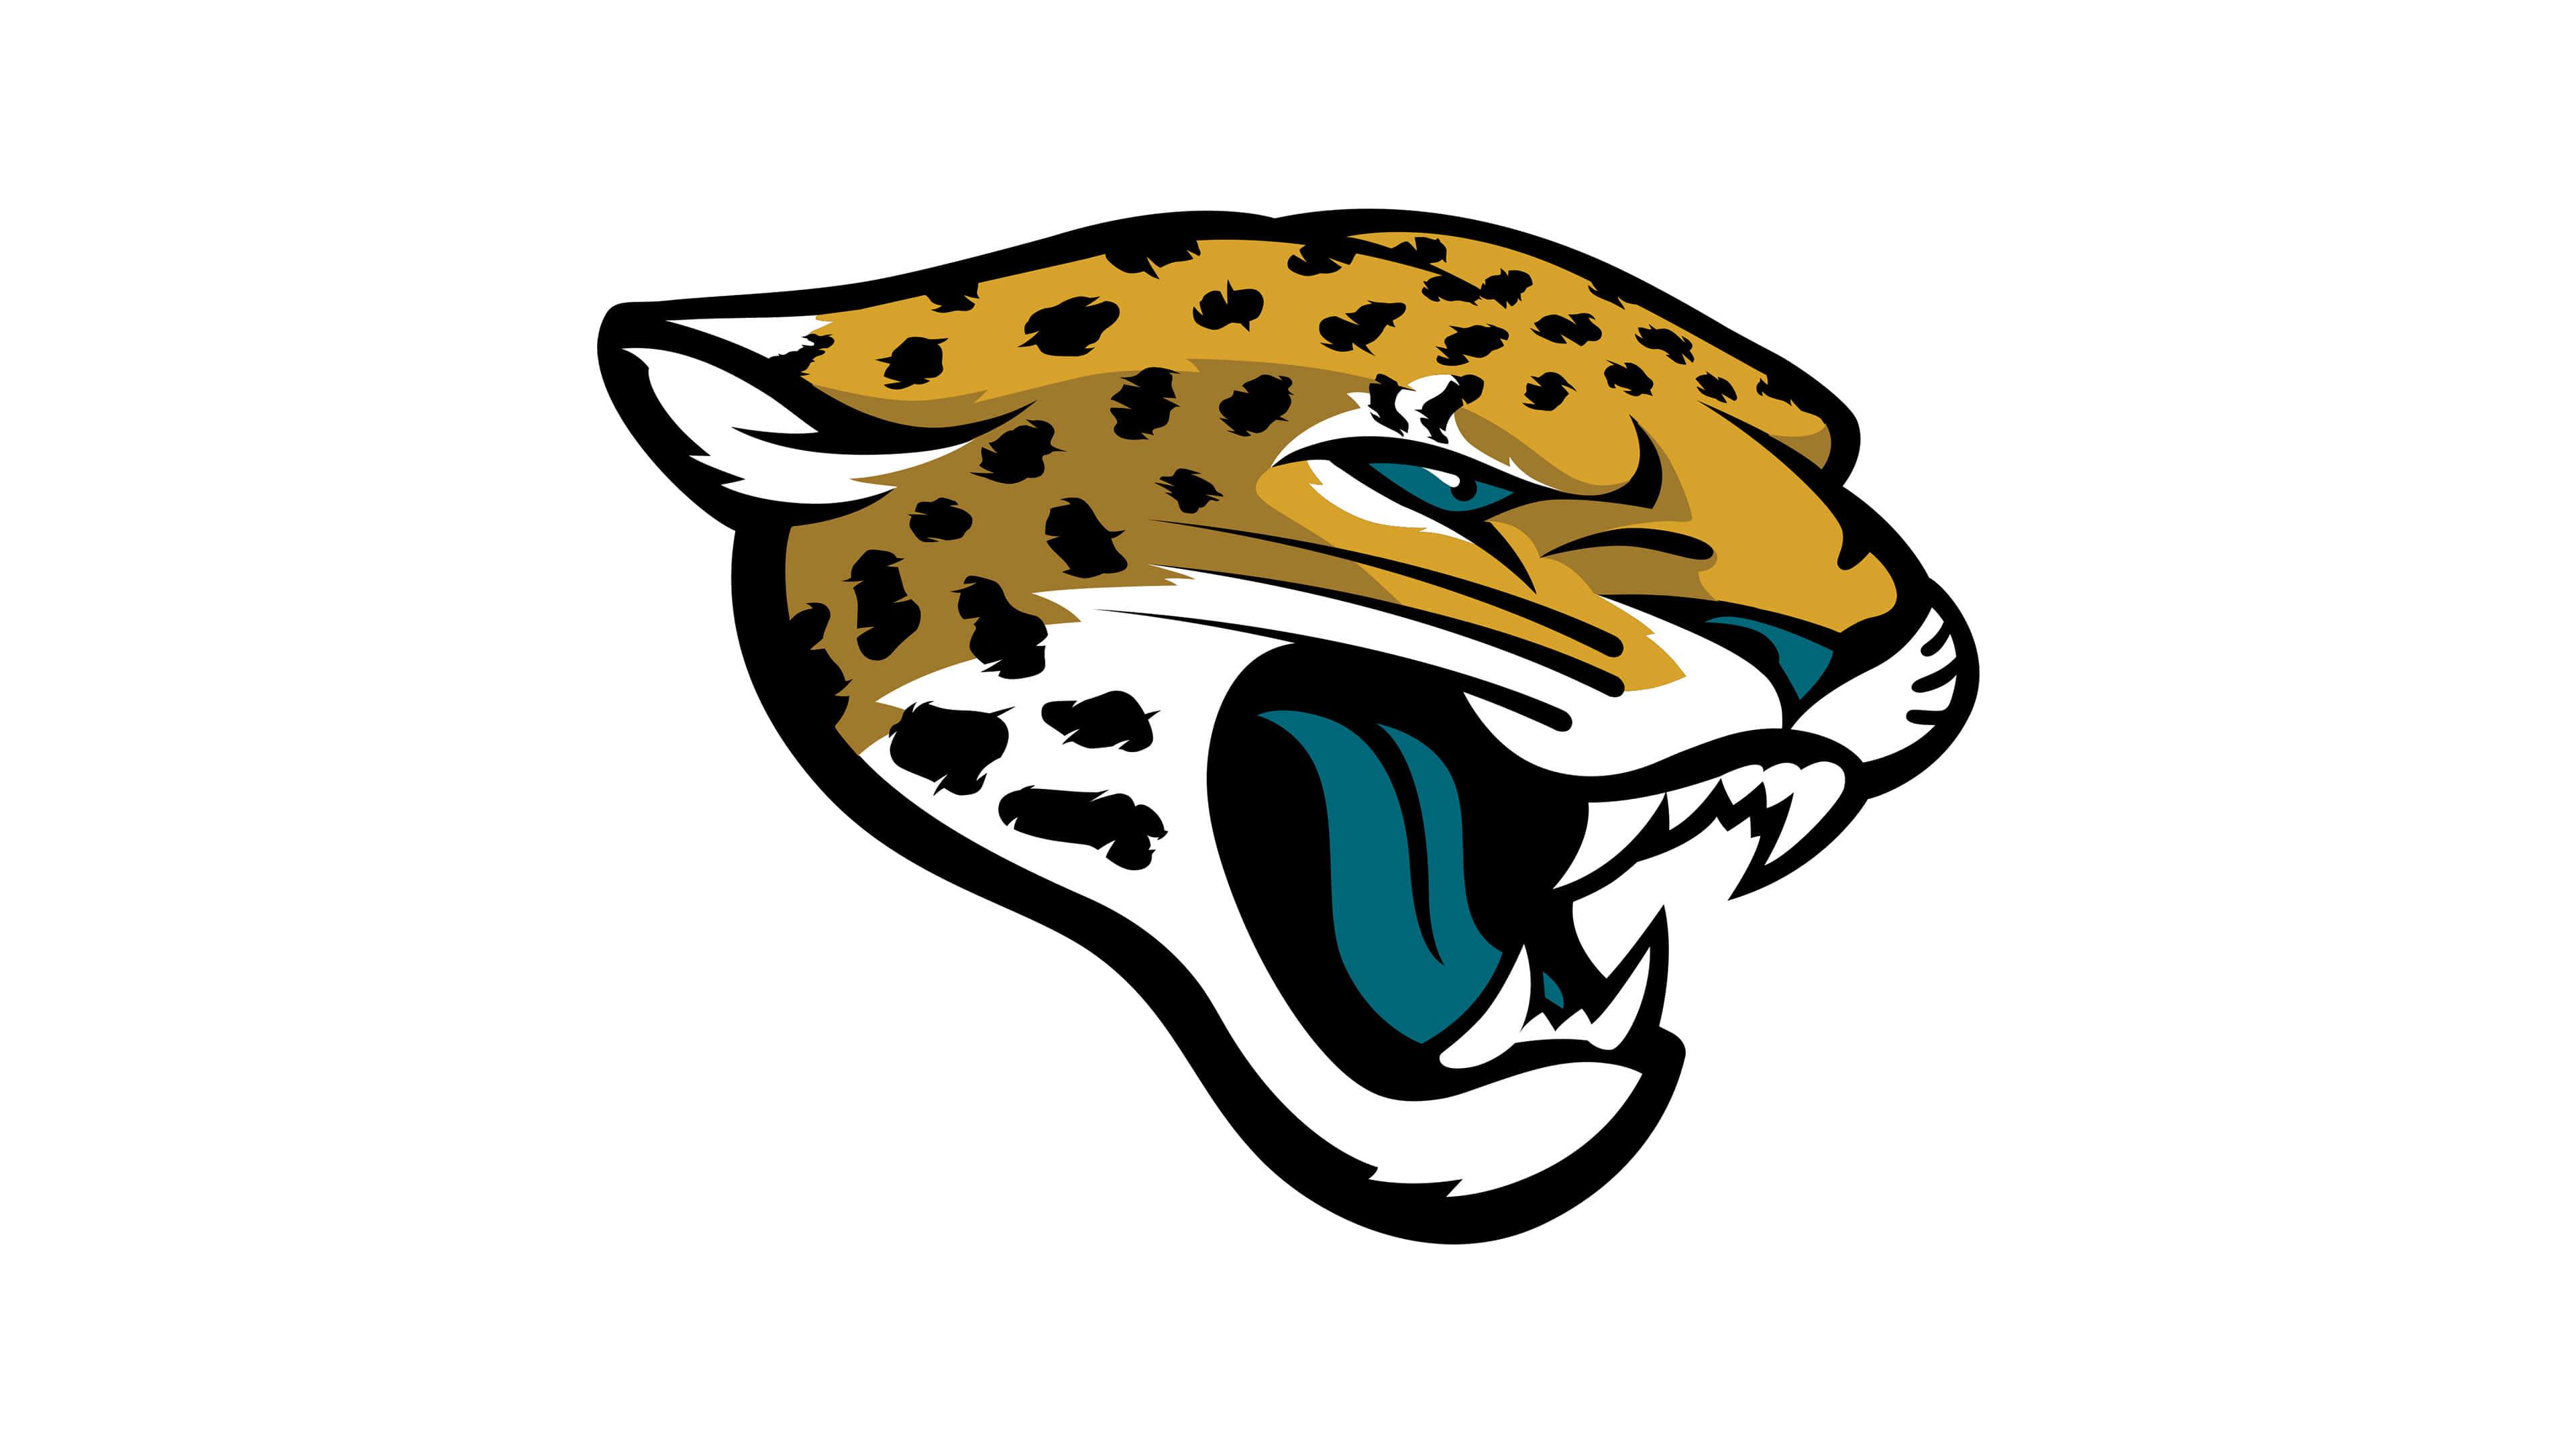 Jacksonville Jaguars Nfl Logo Uhd 4k Wallpaper Pixelz